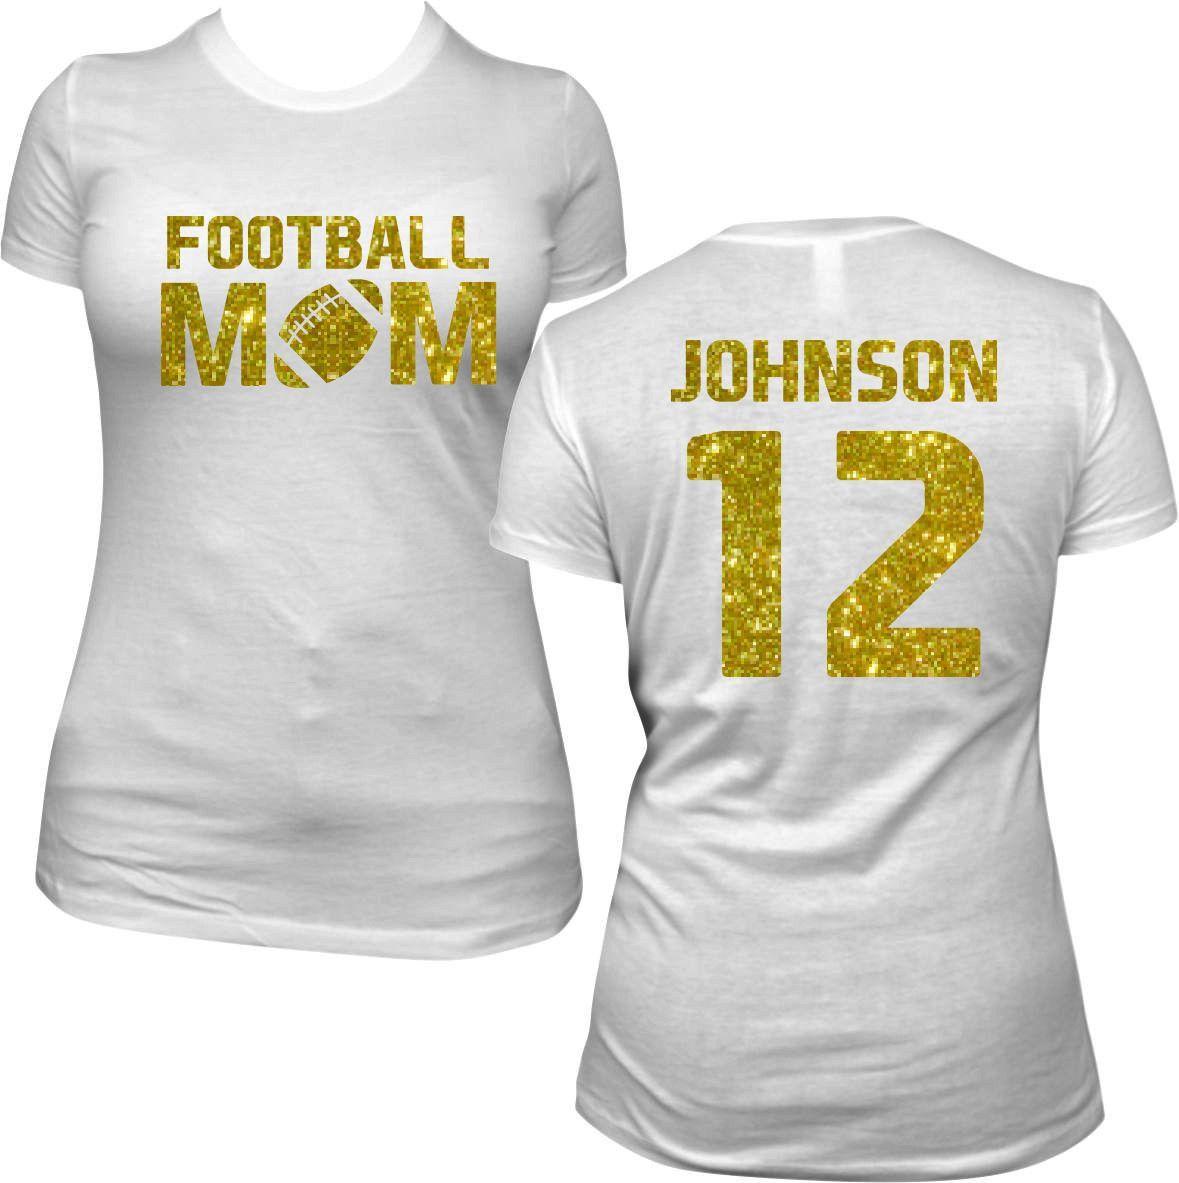 Personalized Football Mom Shirt White Short Sleeve You